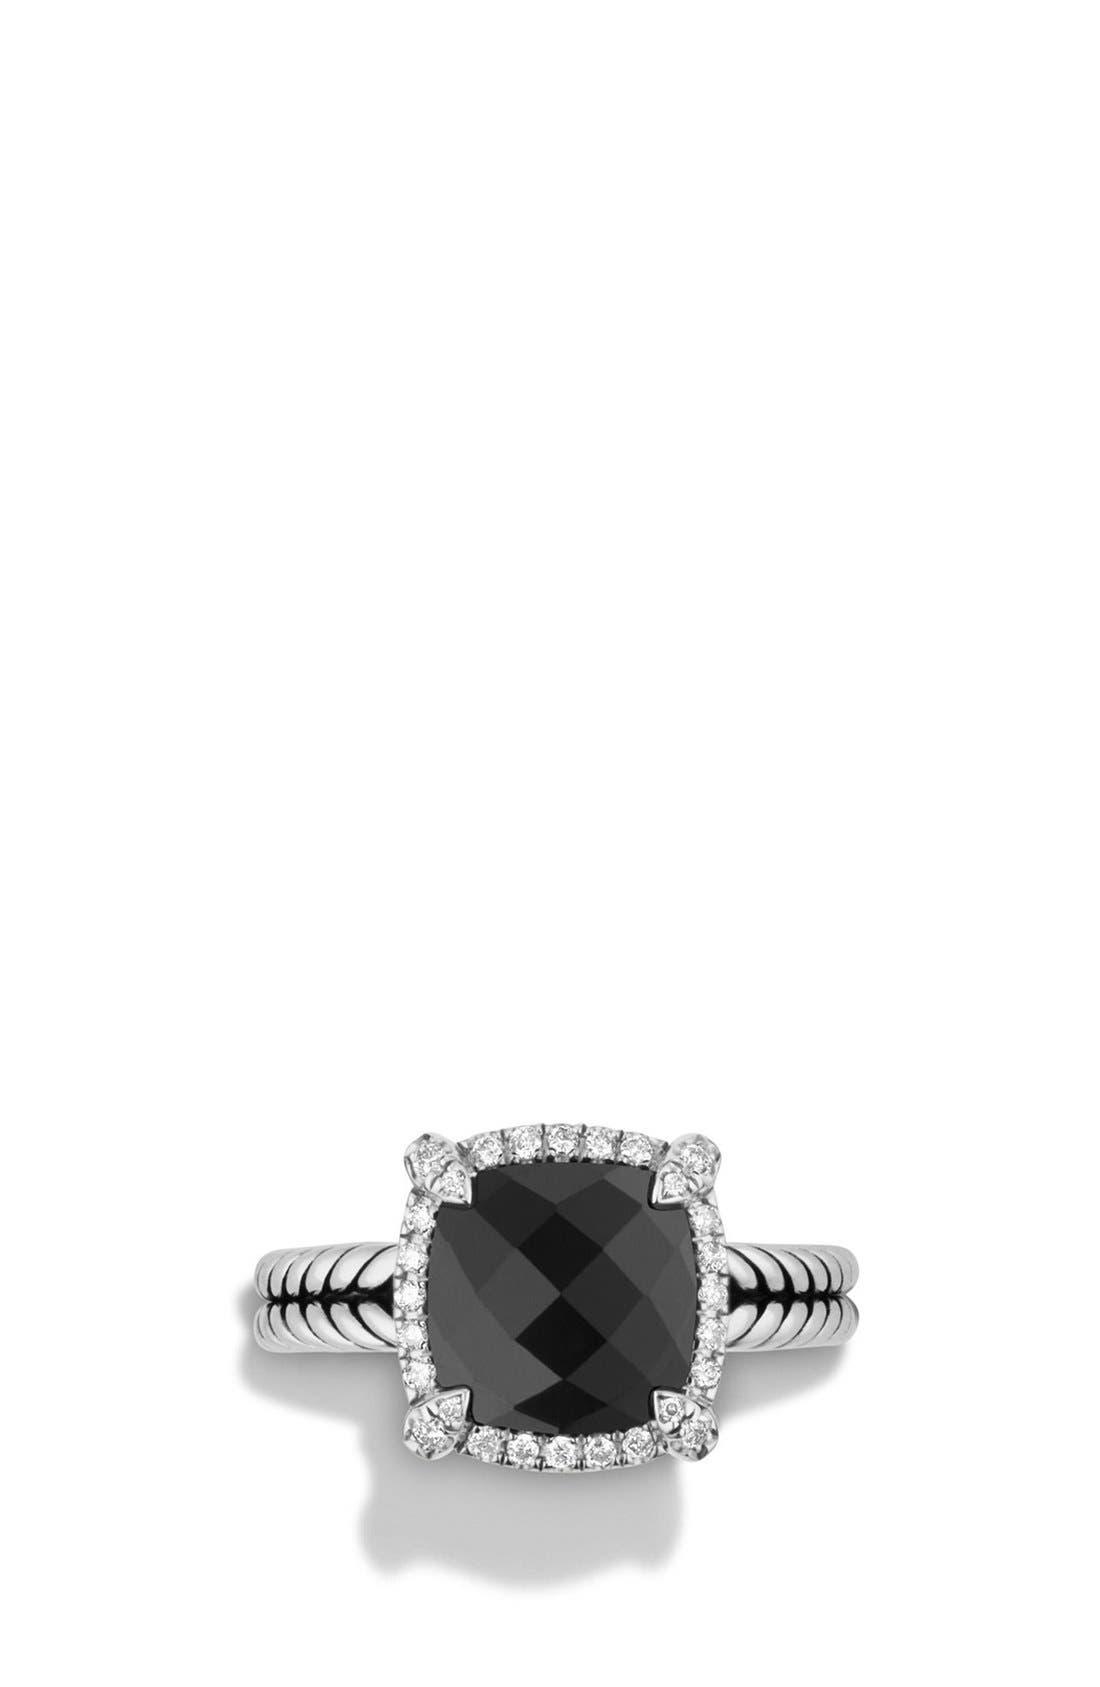 'Châtelaine' Small Pavé Bezel Ring with Diamonds,                             Alternate thumbnail 4, color,                             BLACK ONYX